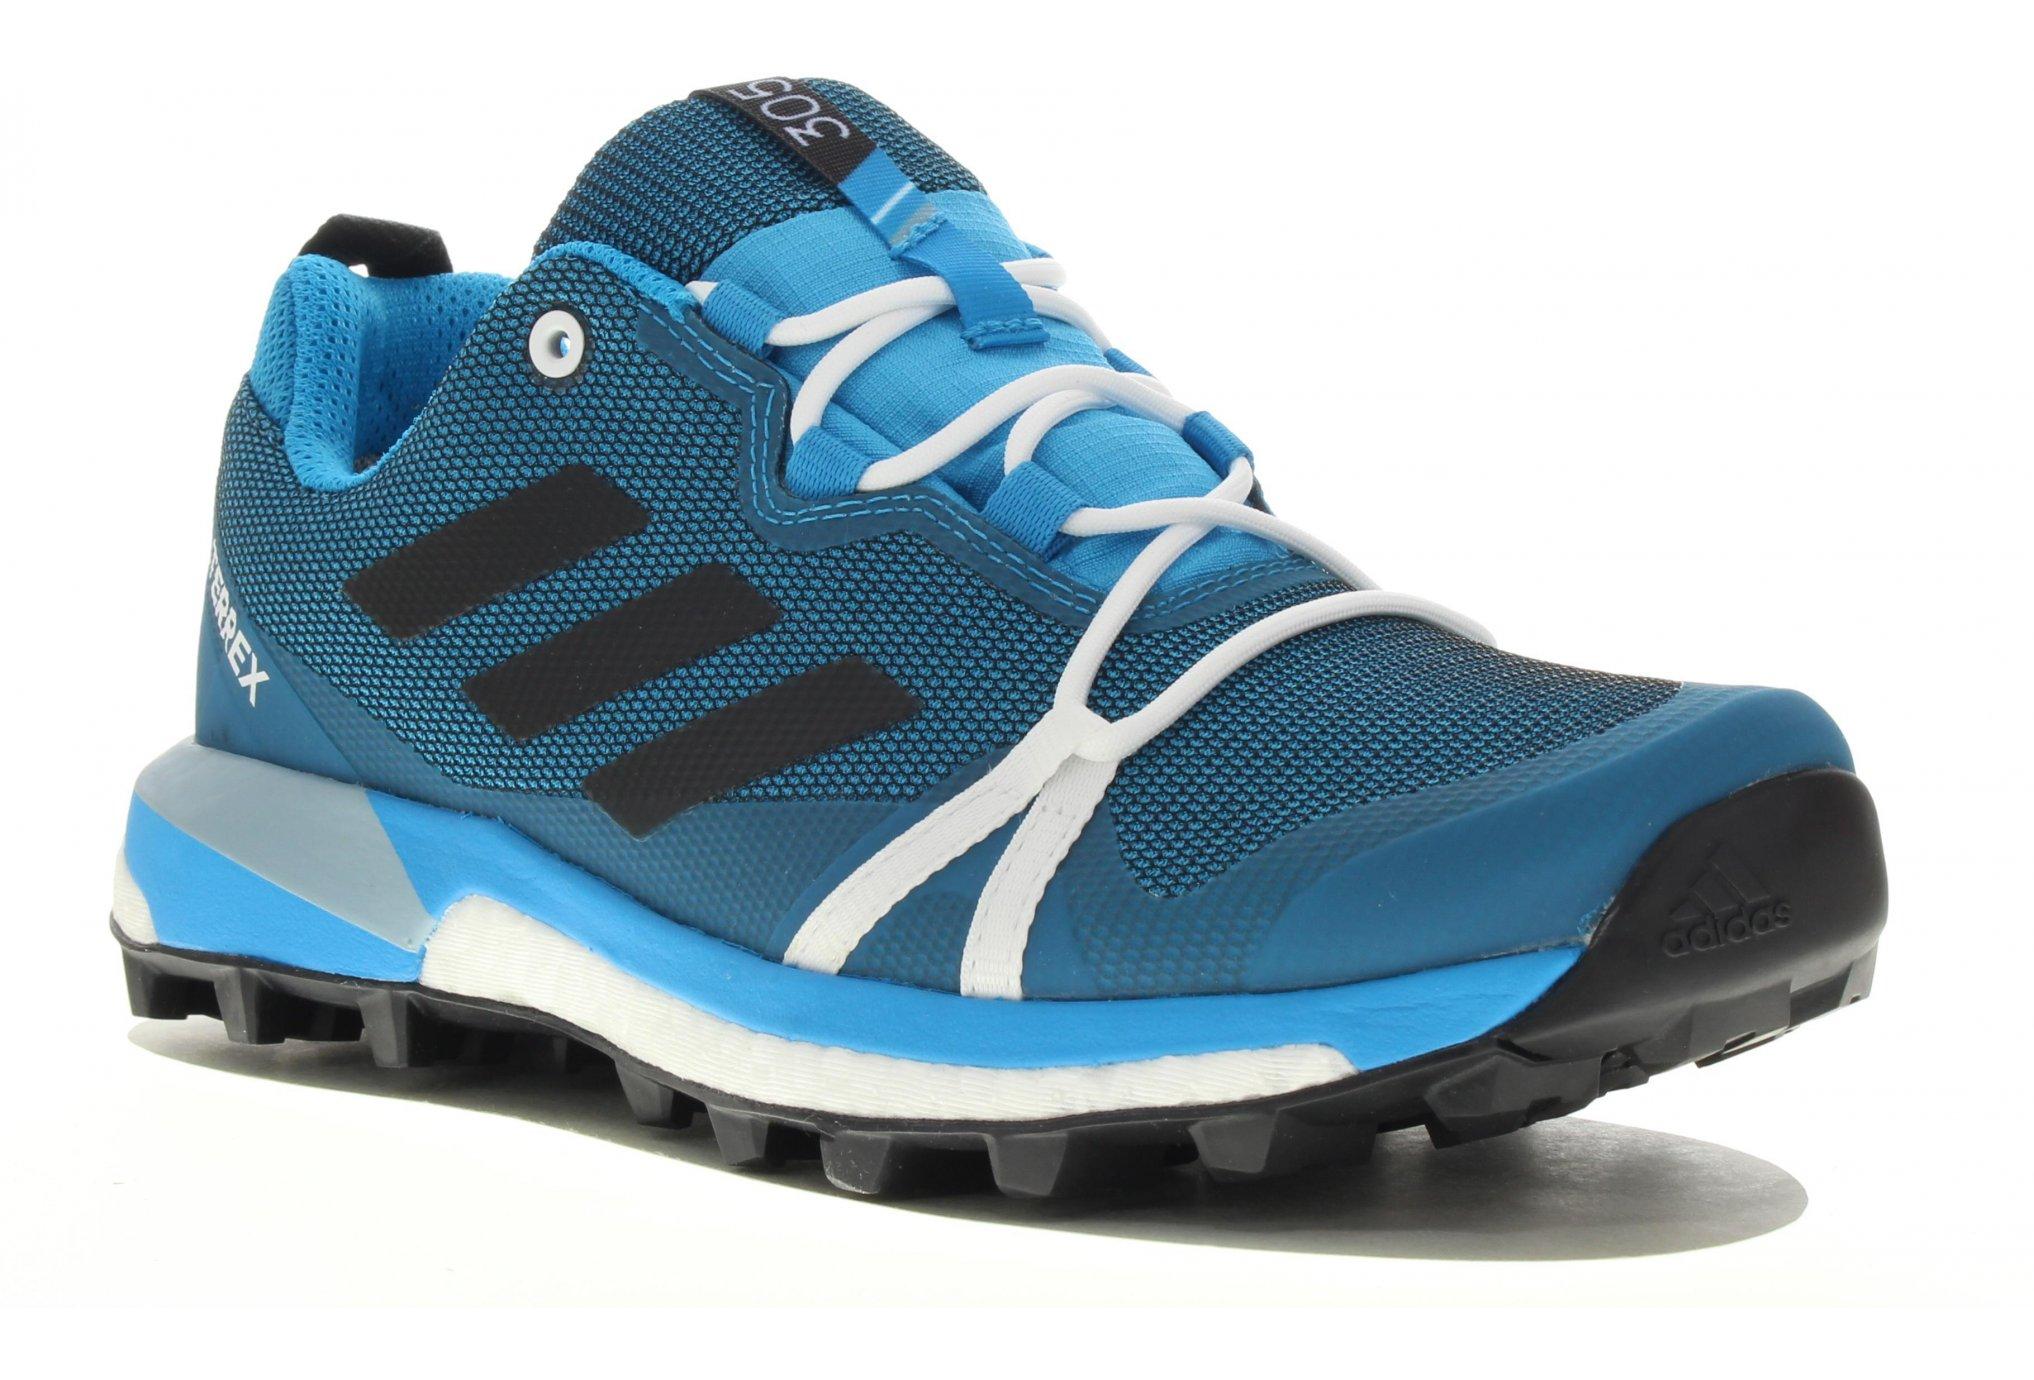 adidas Terrex Skychaser LT Gore-Tex W Diététique Chaussures femme